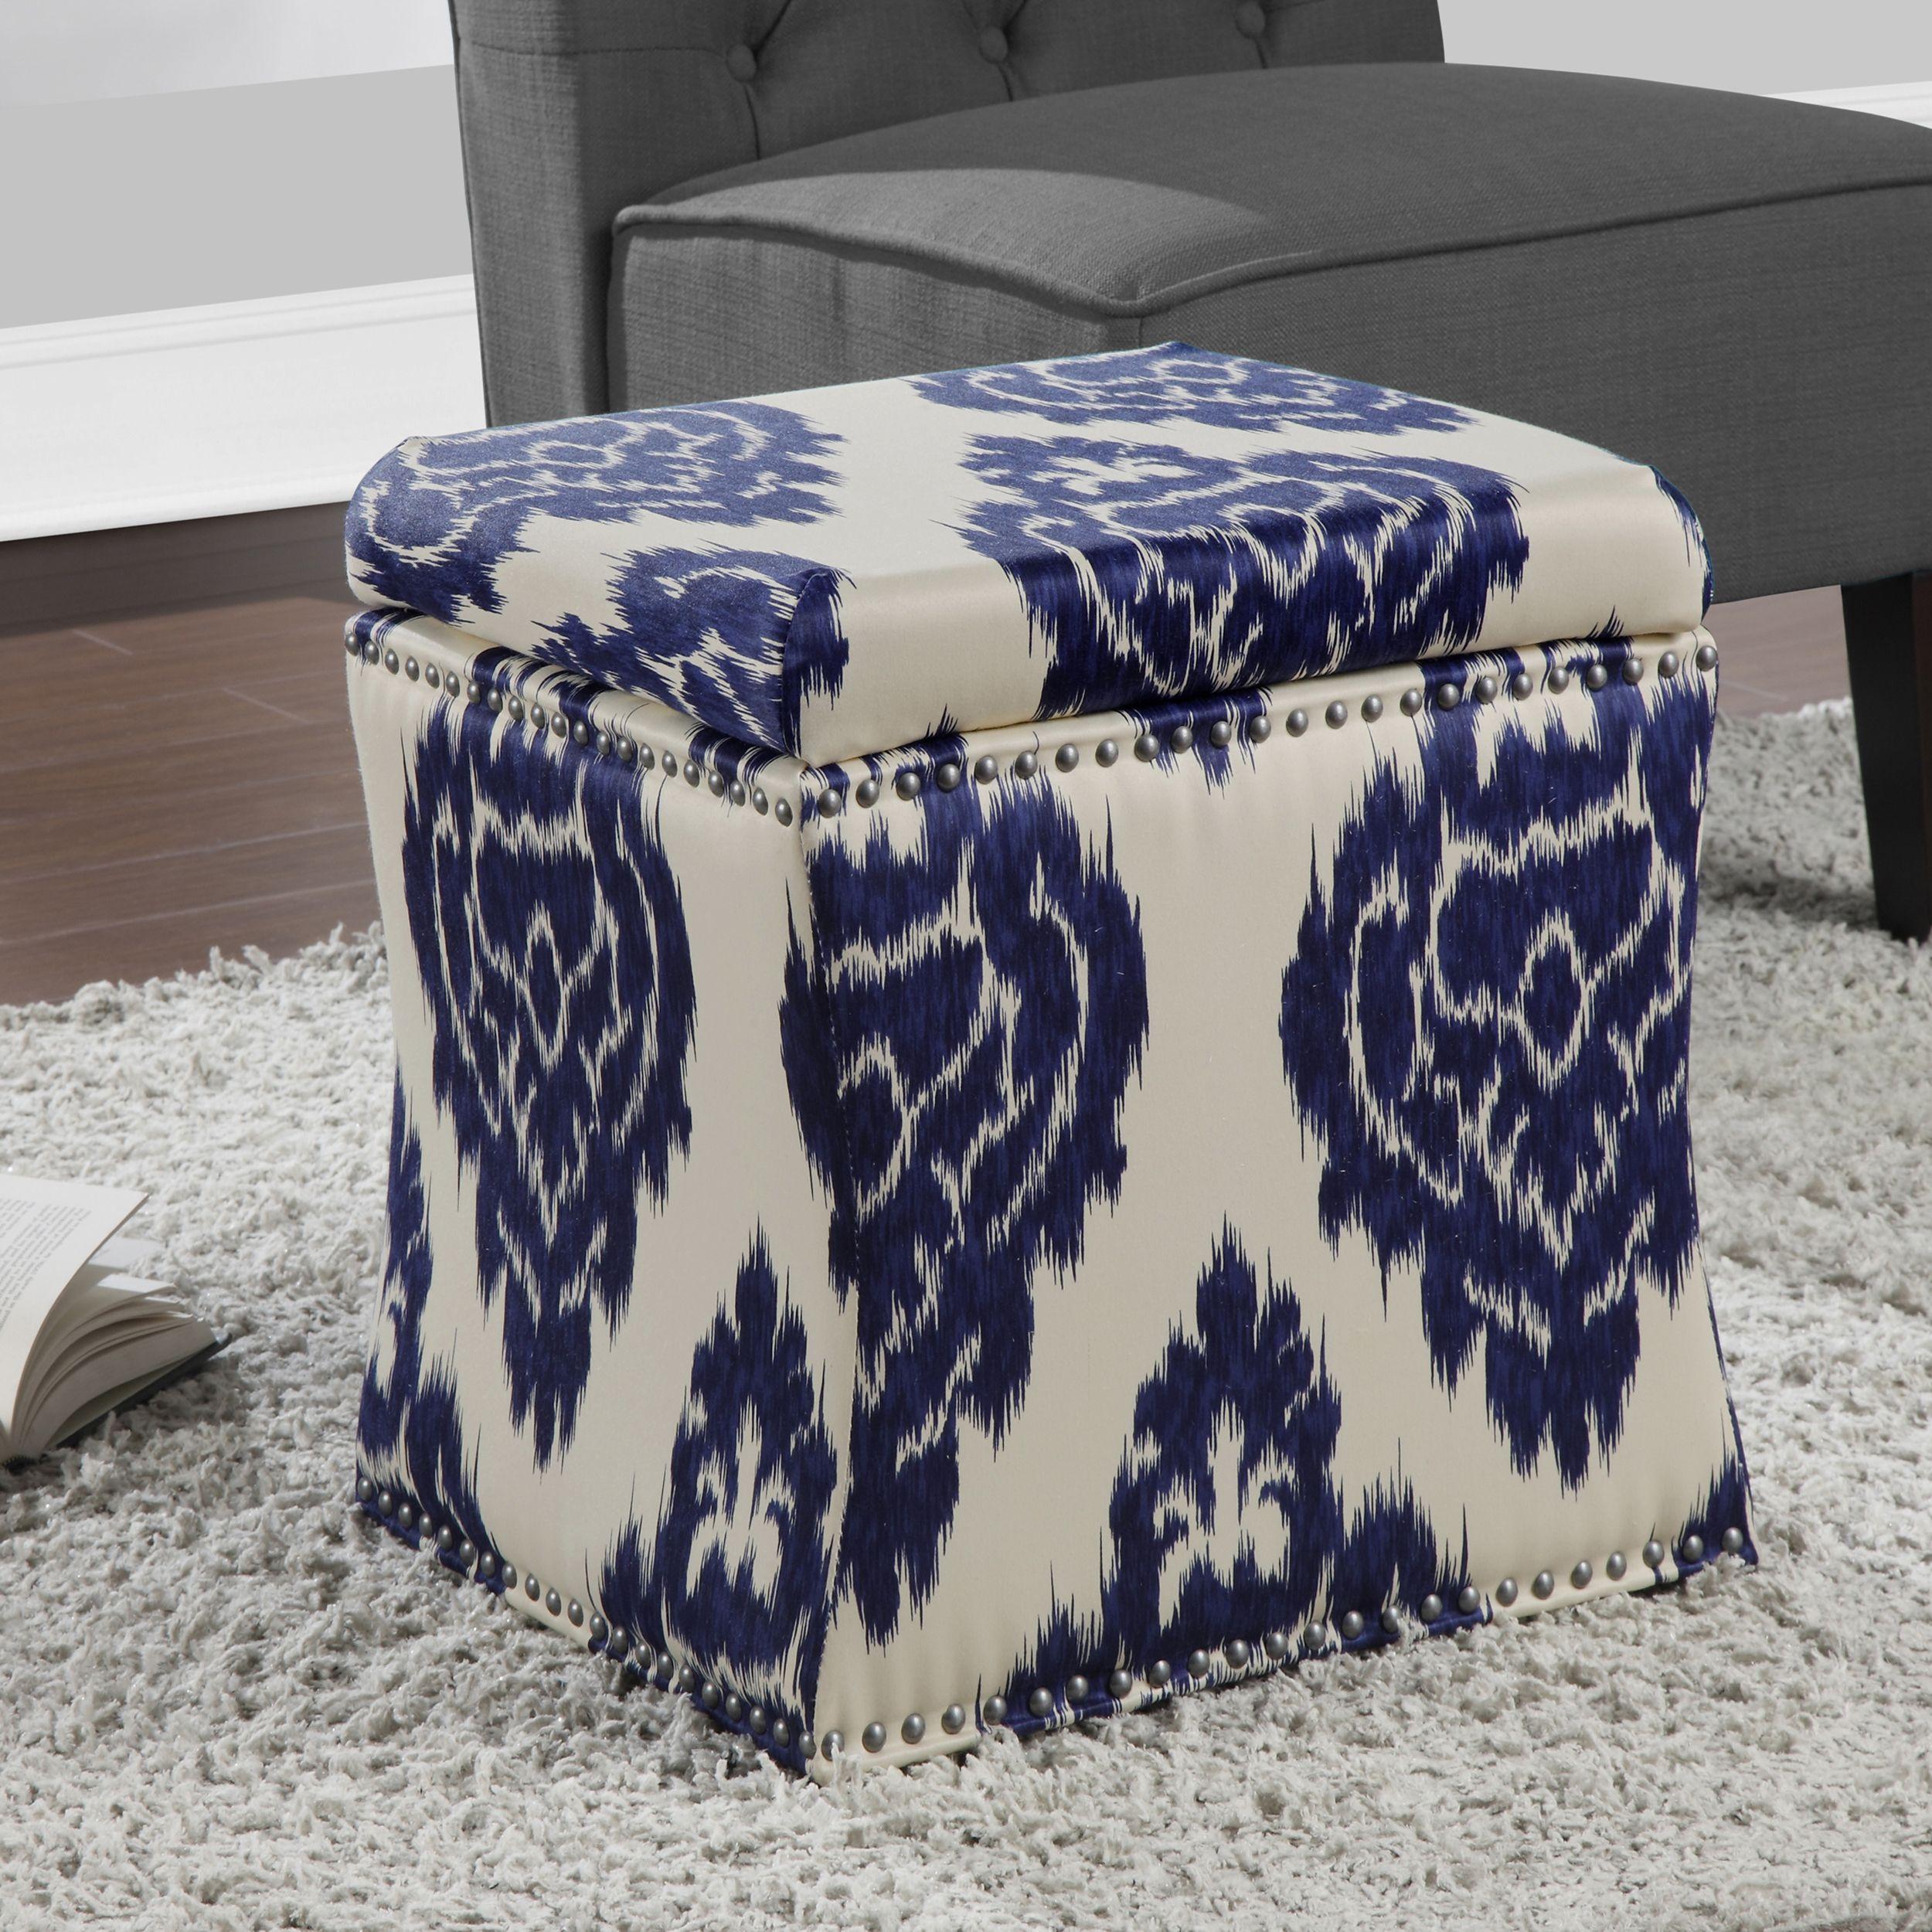 Merveilleux Curved Indigo Ikat Storage Ottoman   Overstock™ Shopping   Great Deals On  Ottomans